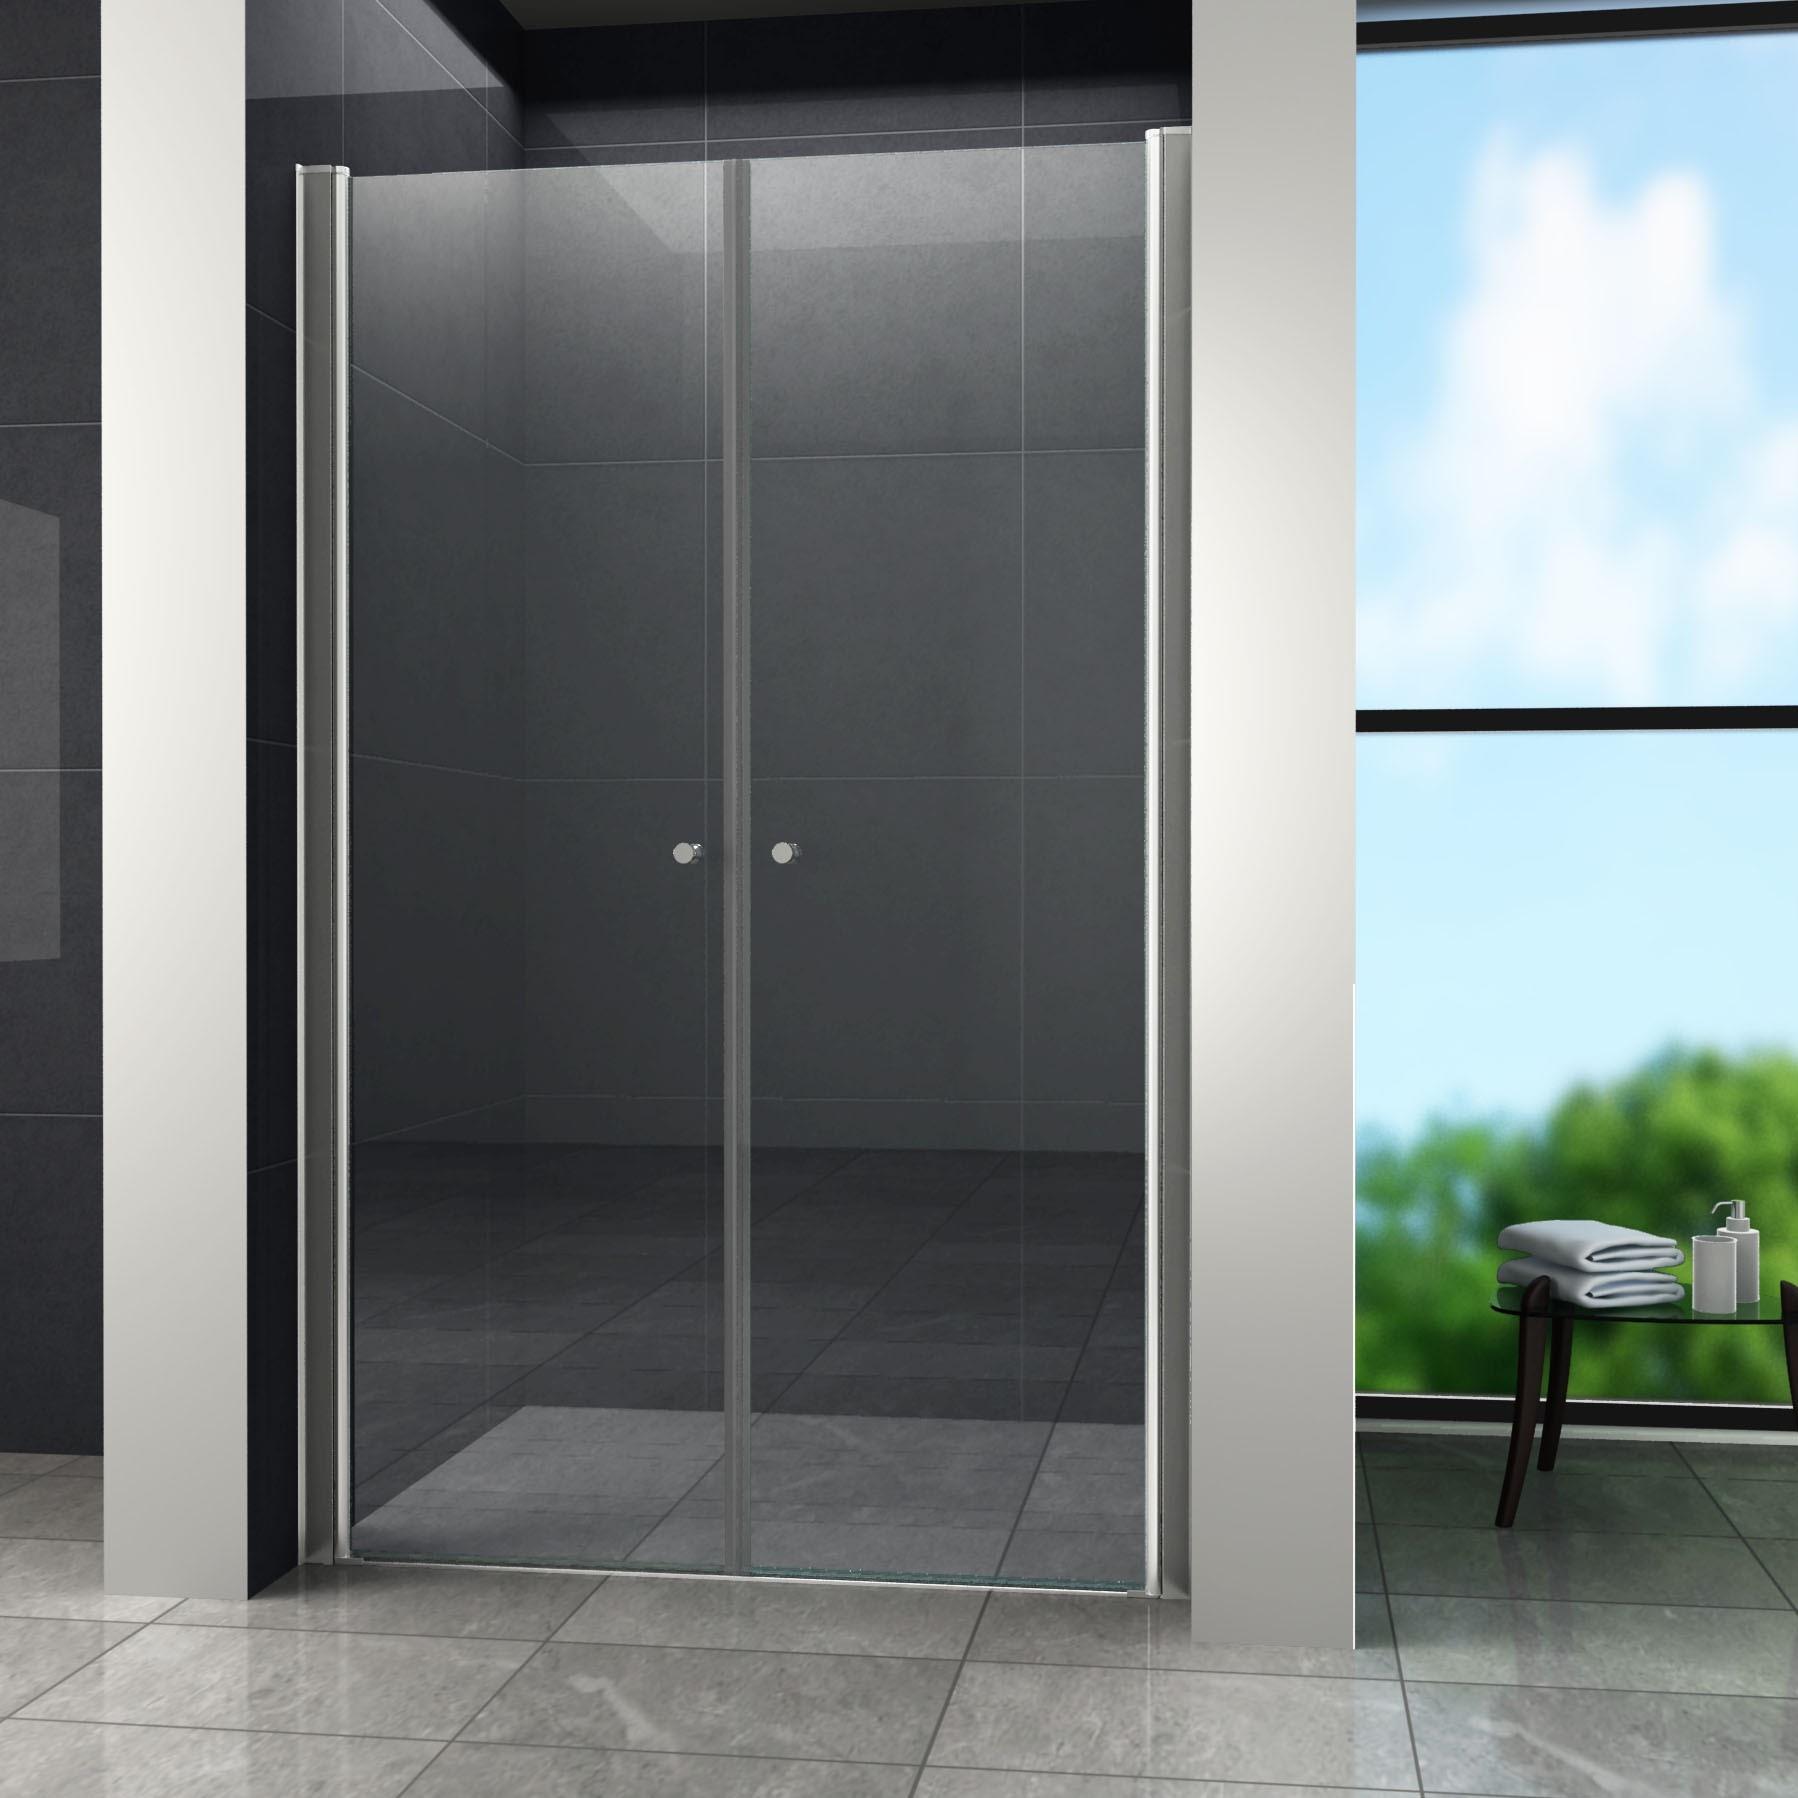 Swing Douchedeur Pendeldeur 90x180 cm Helder Glas binnen 4 tot 7 werkdagen in huis met voordeel